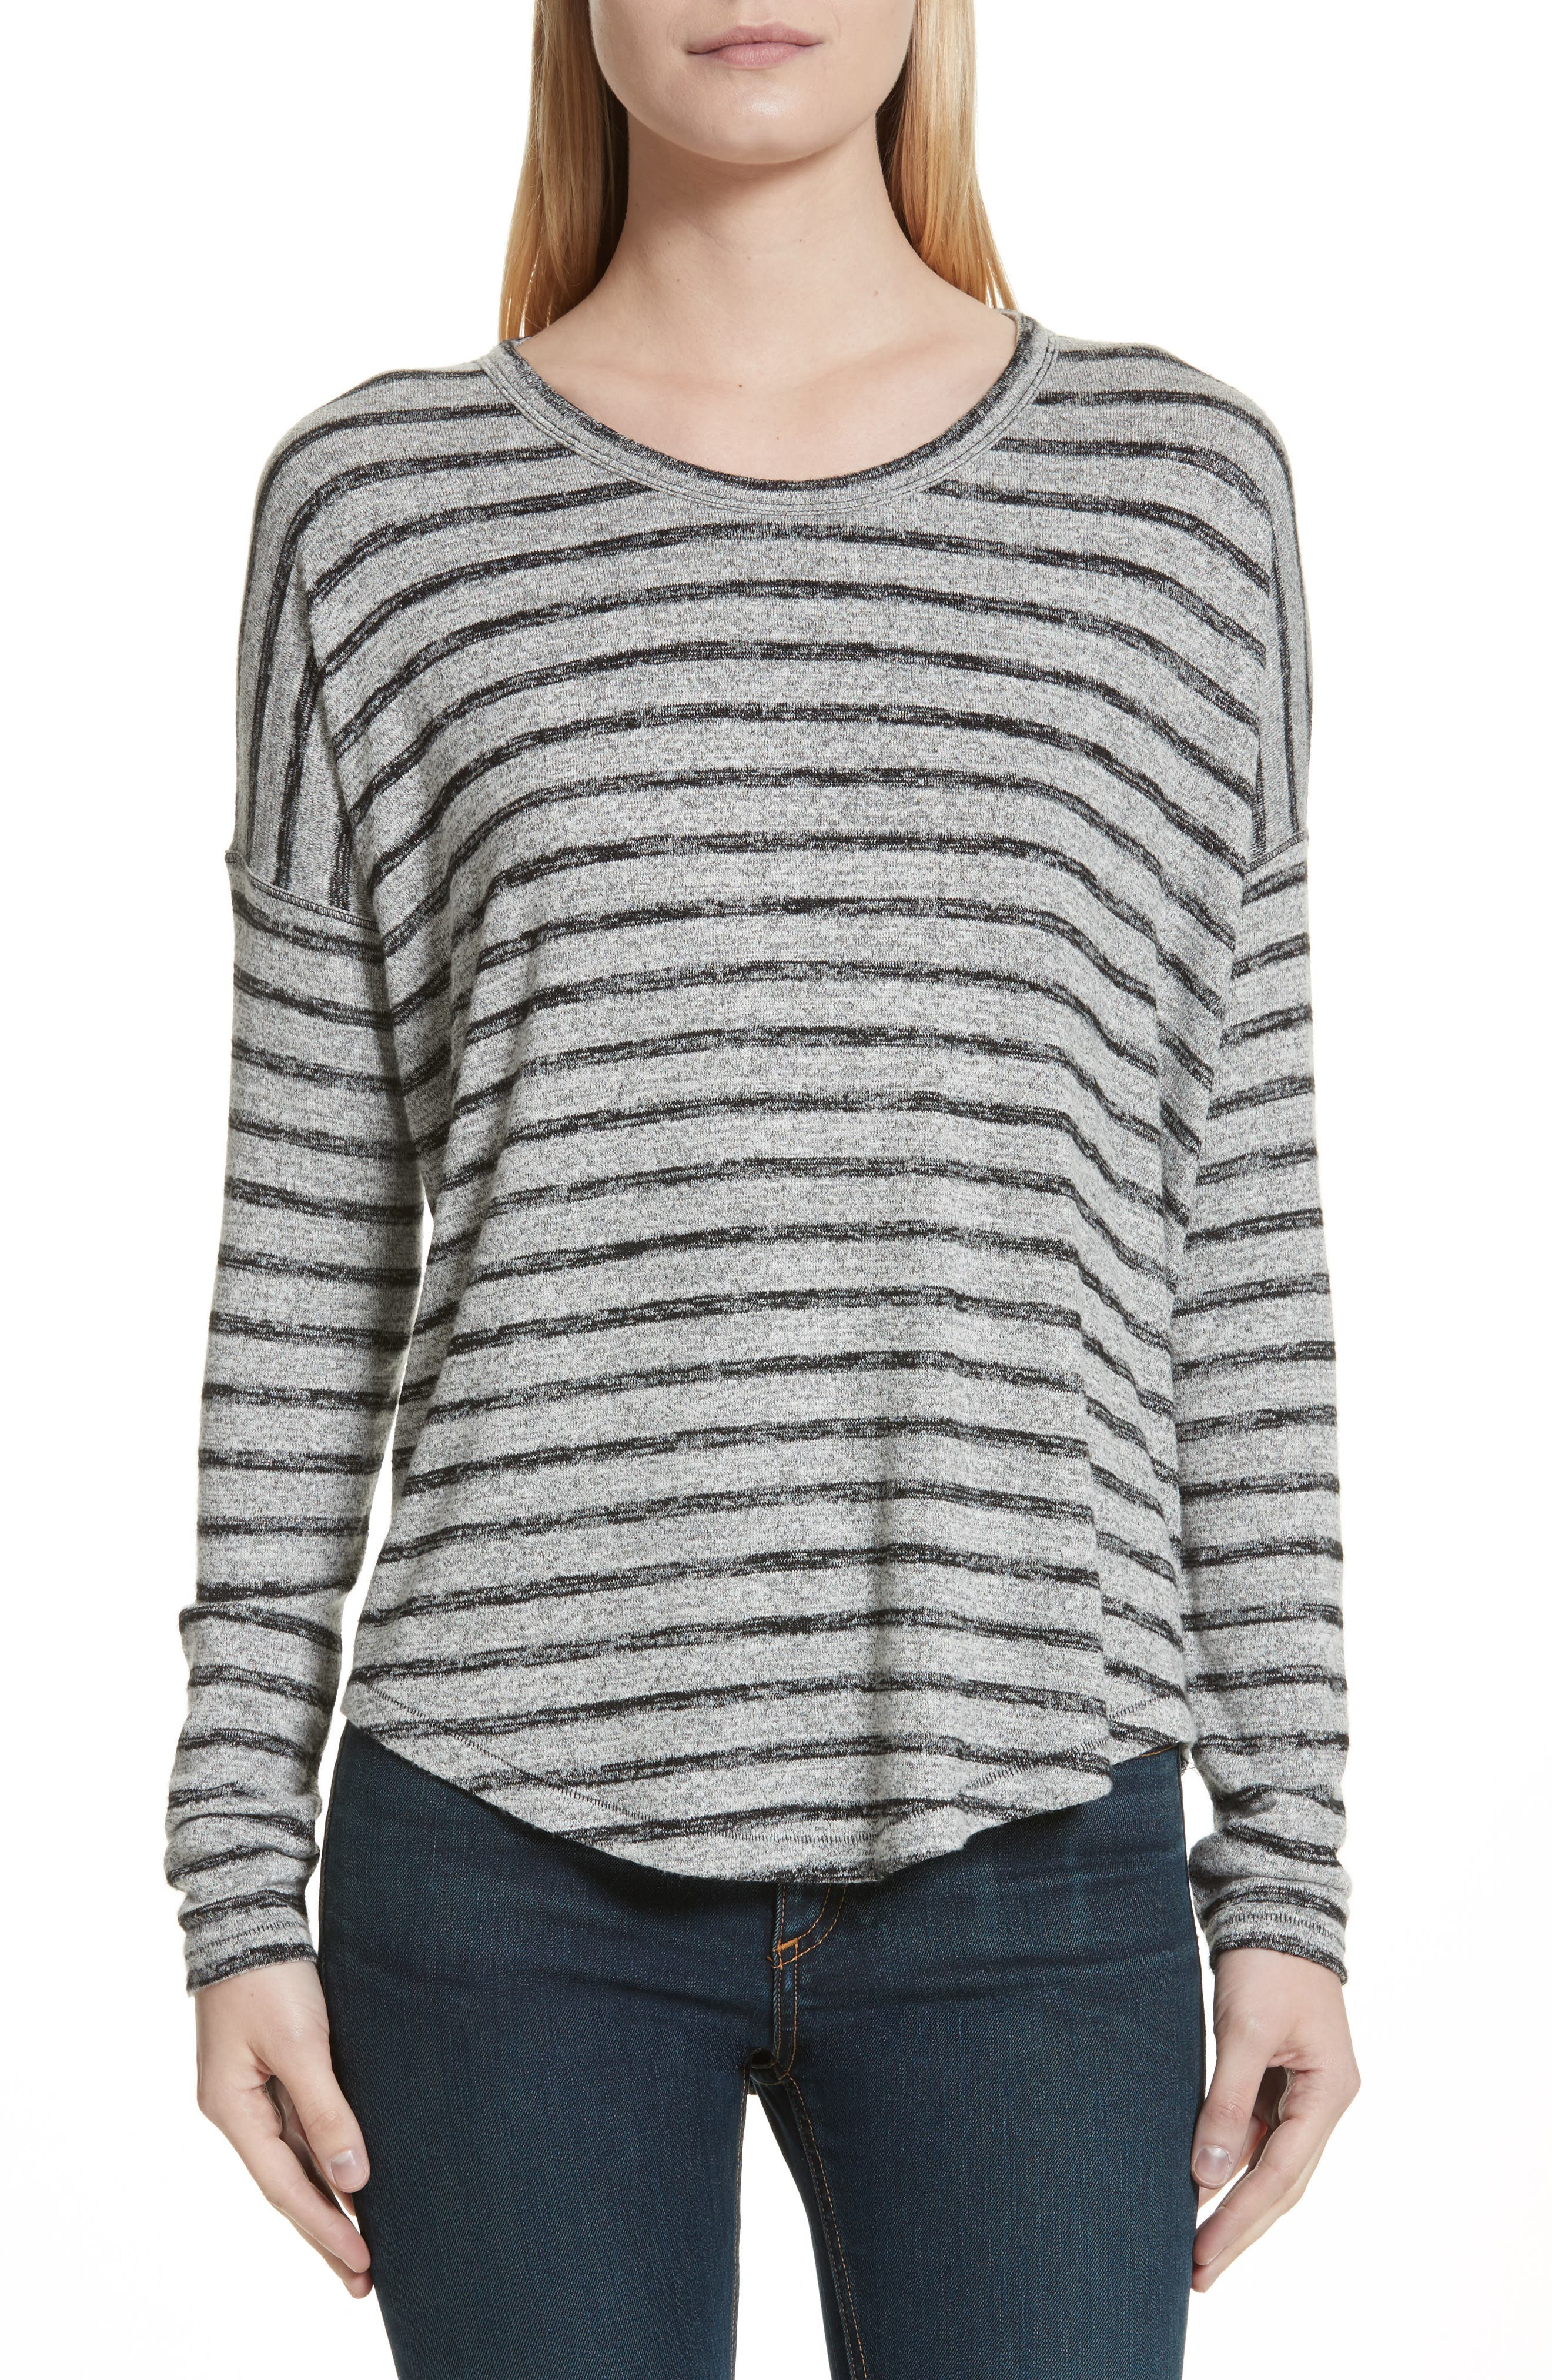 Hudson Stripe Top,                         Main,                         color, Heather Grey/ Black